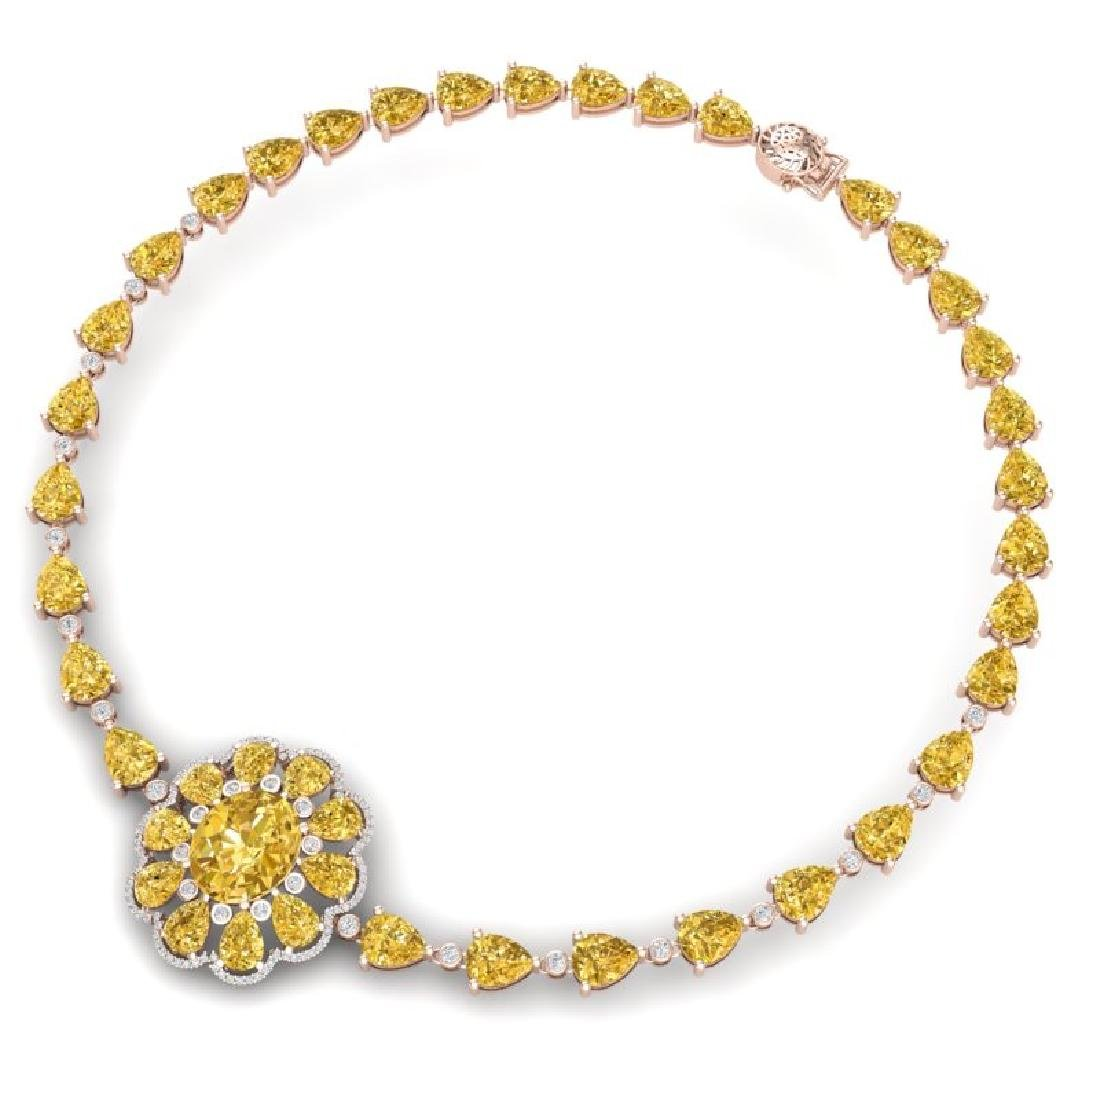 72.38 CTW Royalty Canary Citrine & VS Diamond Necklace - 3